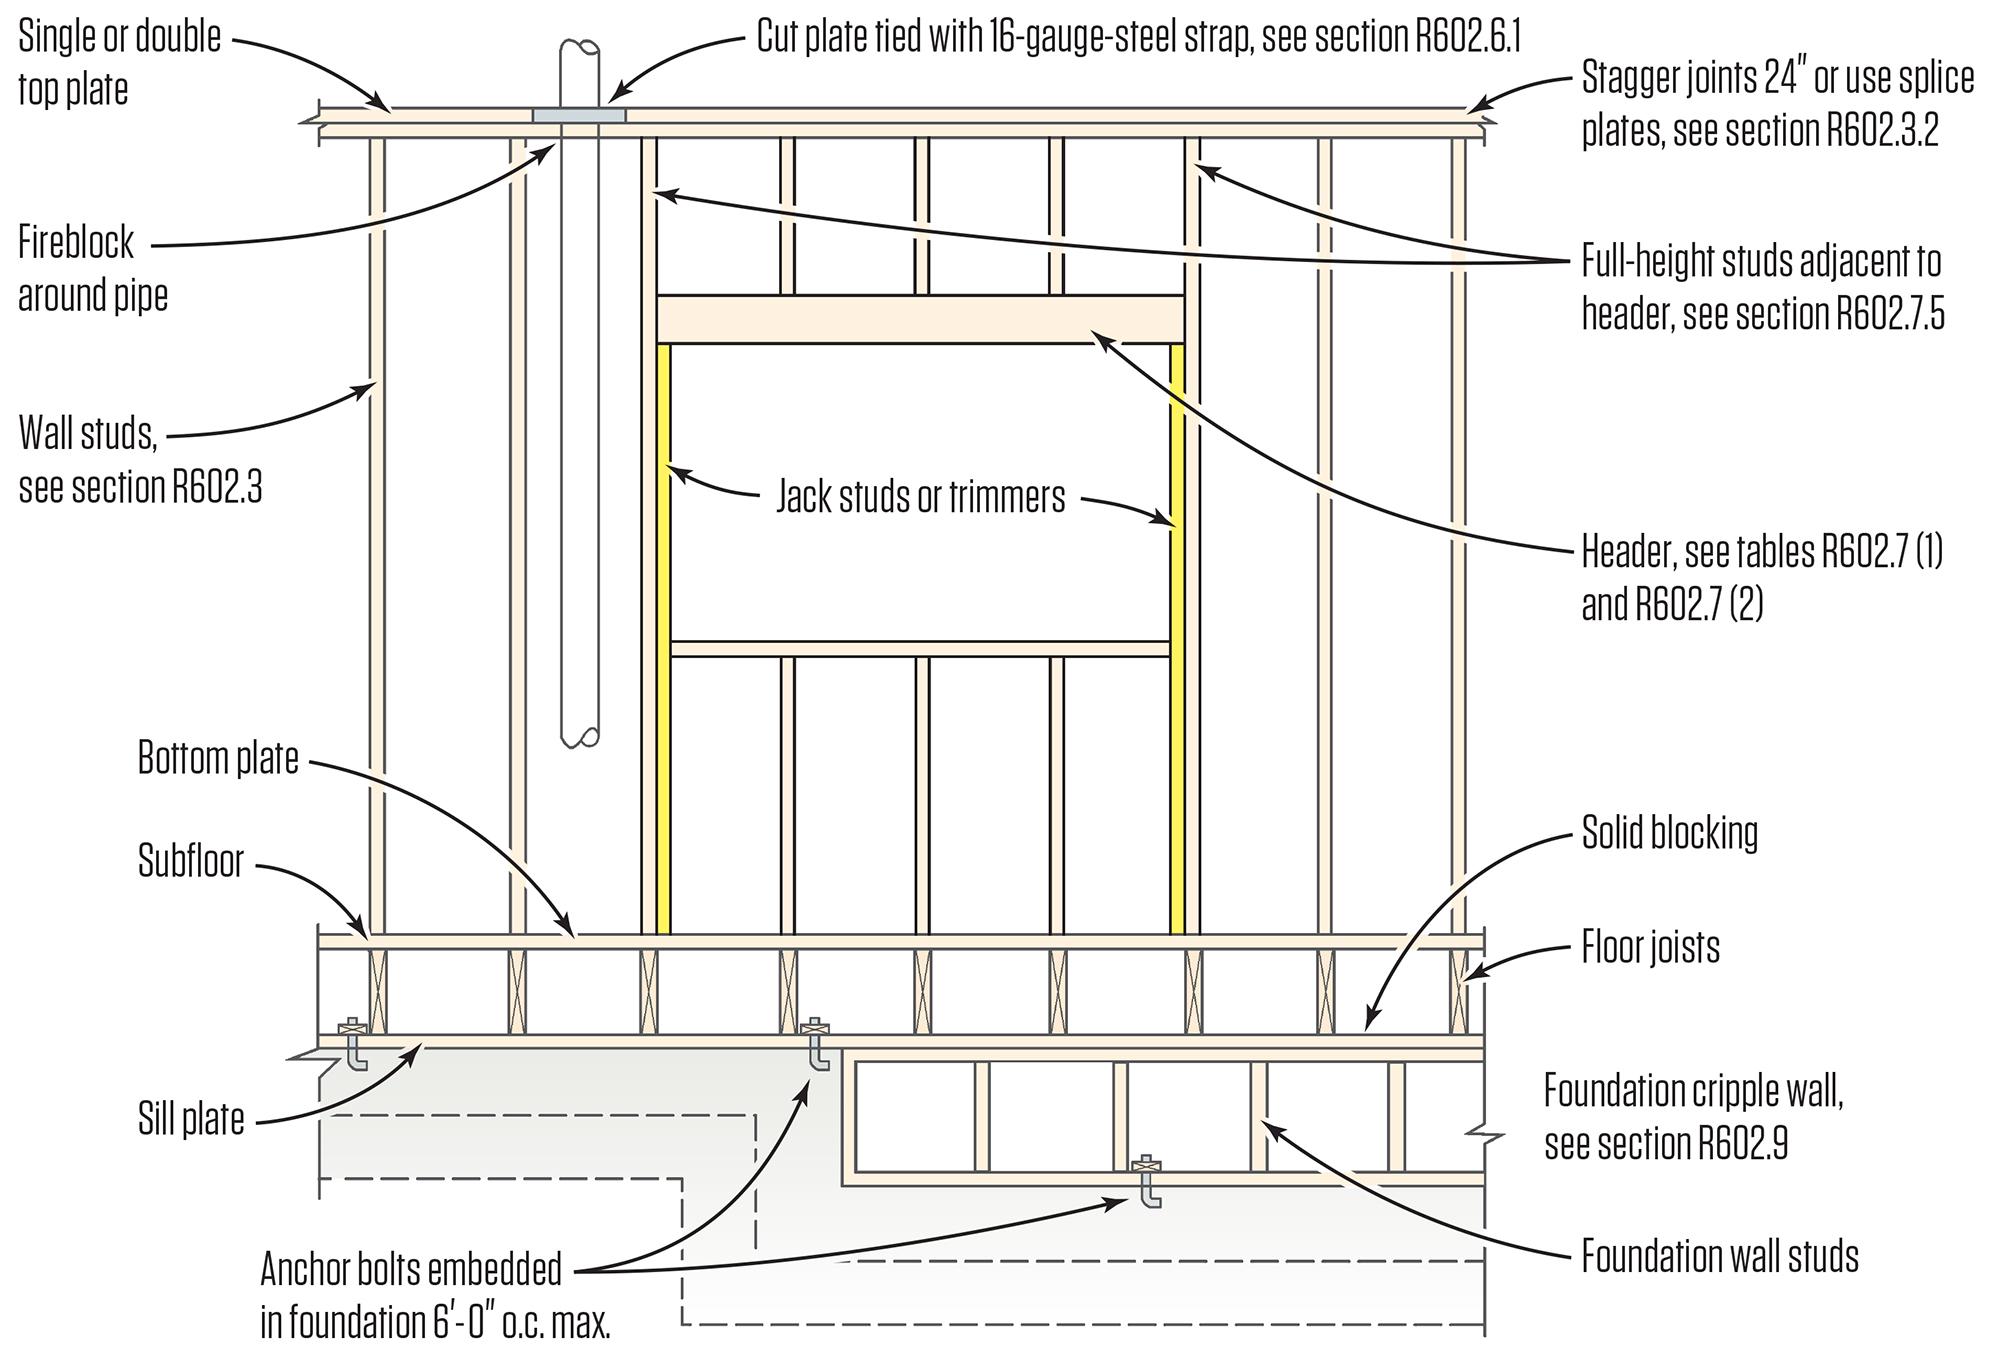 Jackson Hvac Zone Wiring Diagram Diagrams Library Rtu